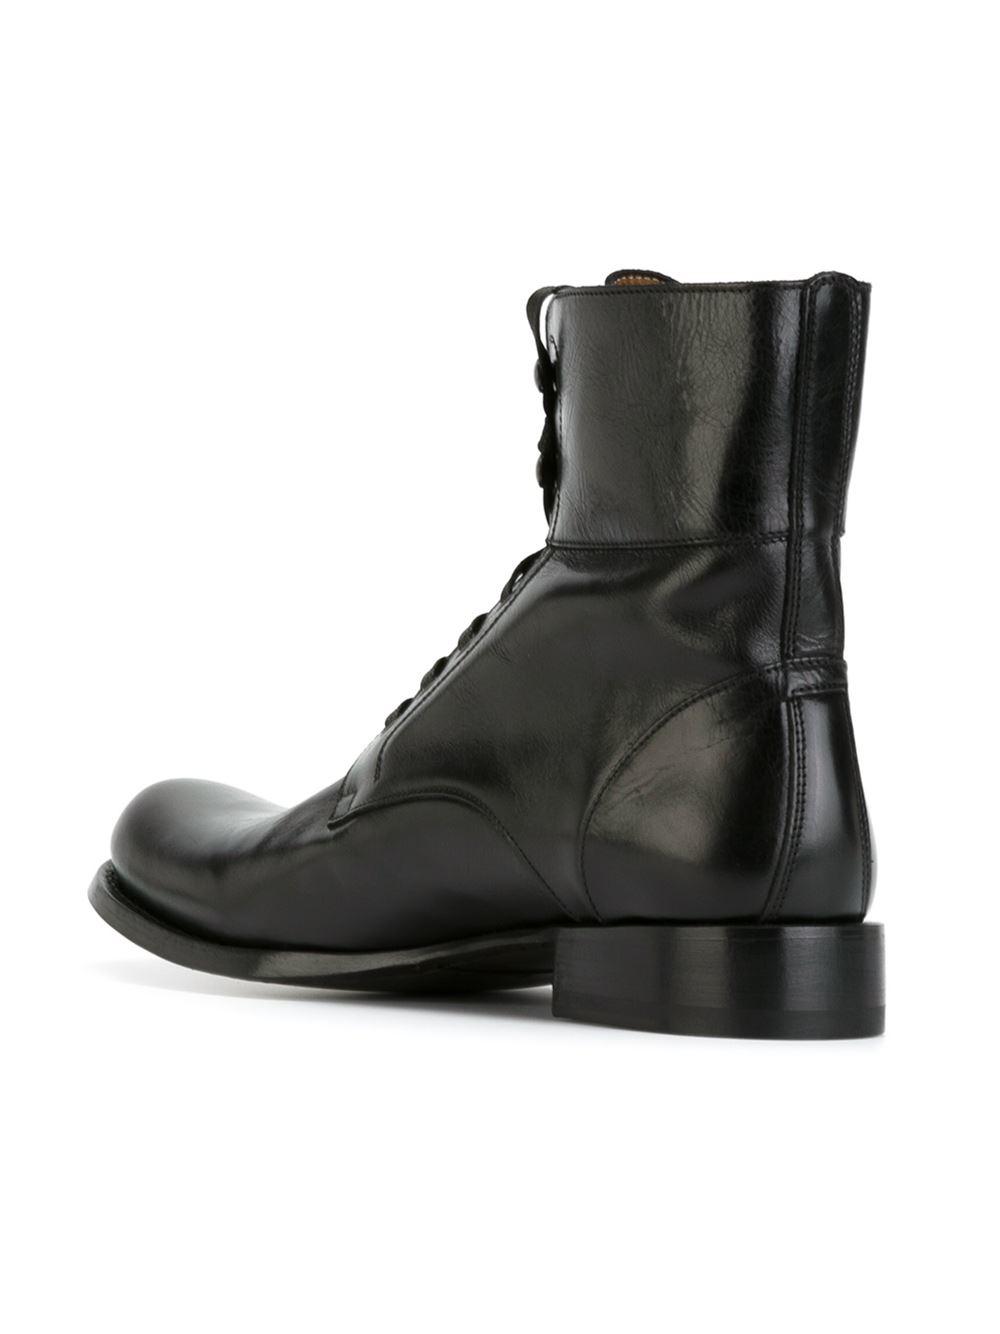 John Varvatos Lace Up Boots In Black For Men Lyst